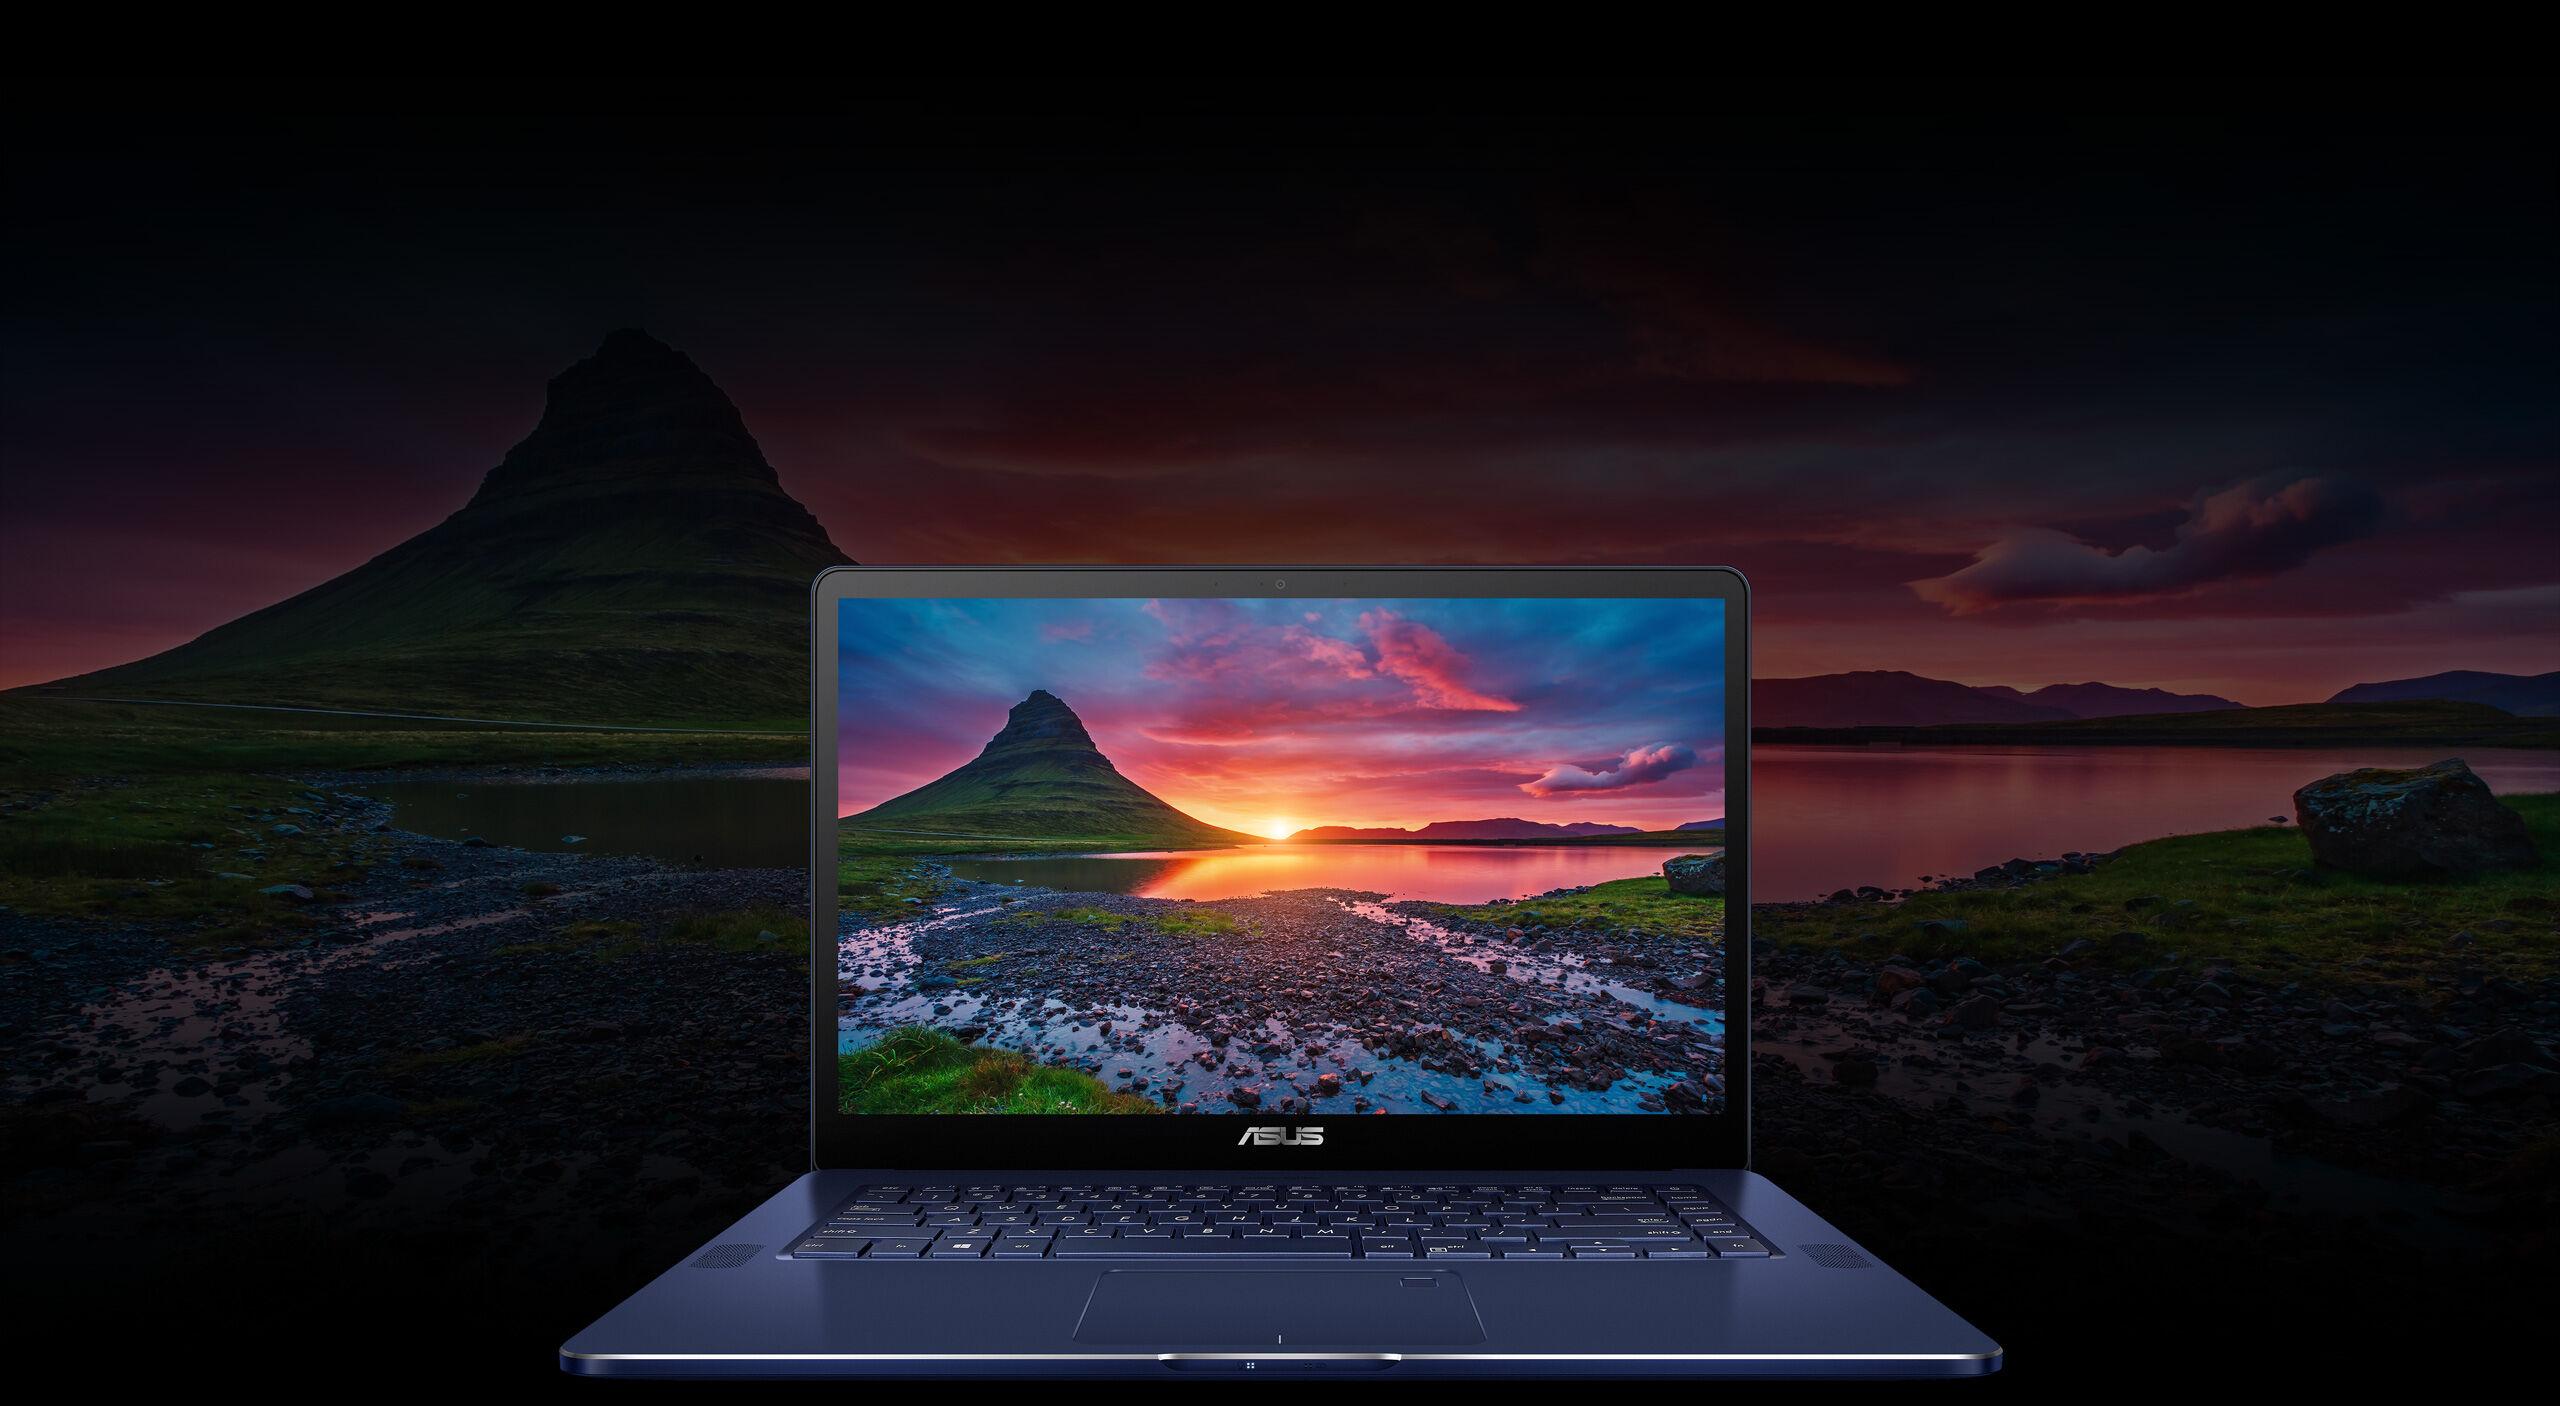 Asus Zenbook Pro Ux550 3